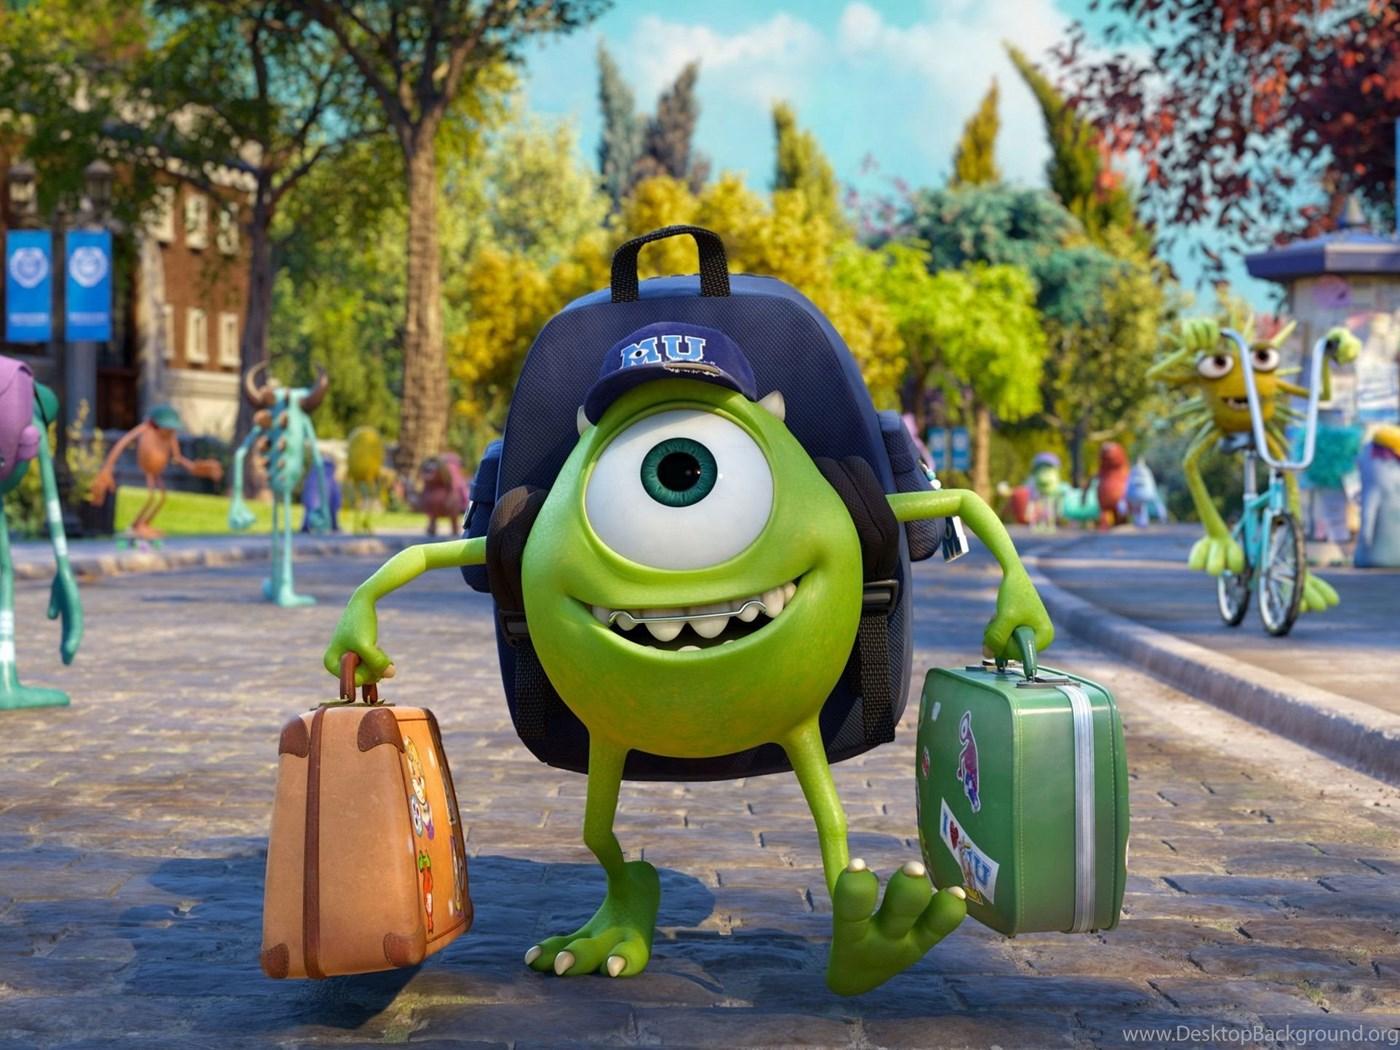 Most Inspiring Wallpaper Movie Animated - 476975_monsters-university-disney-pixar-cartoon-movie-wallpapers_2560x1440_h  Snapshot_99569.jpg